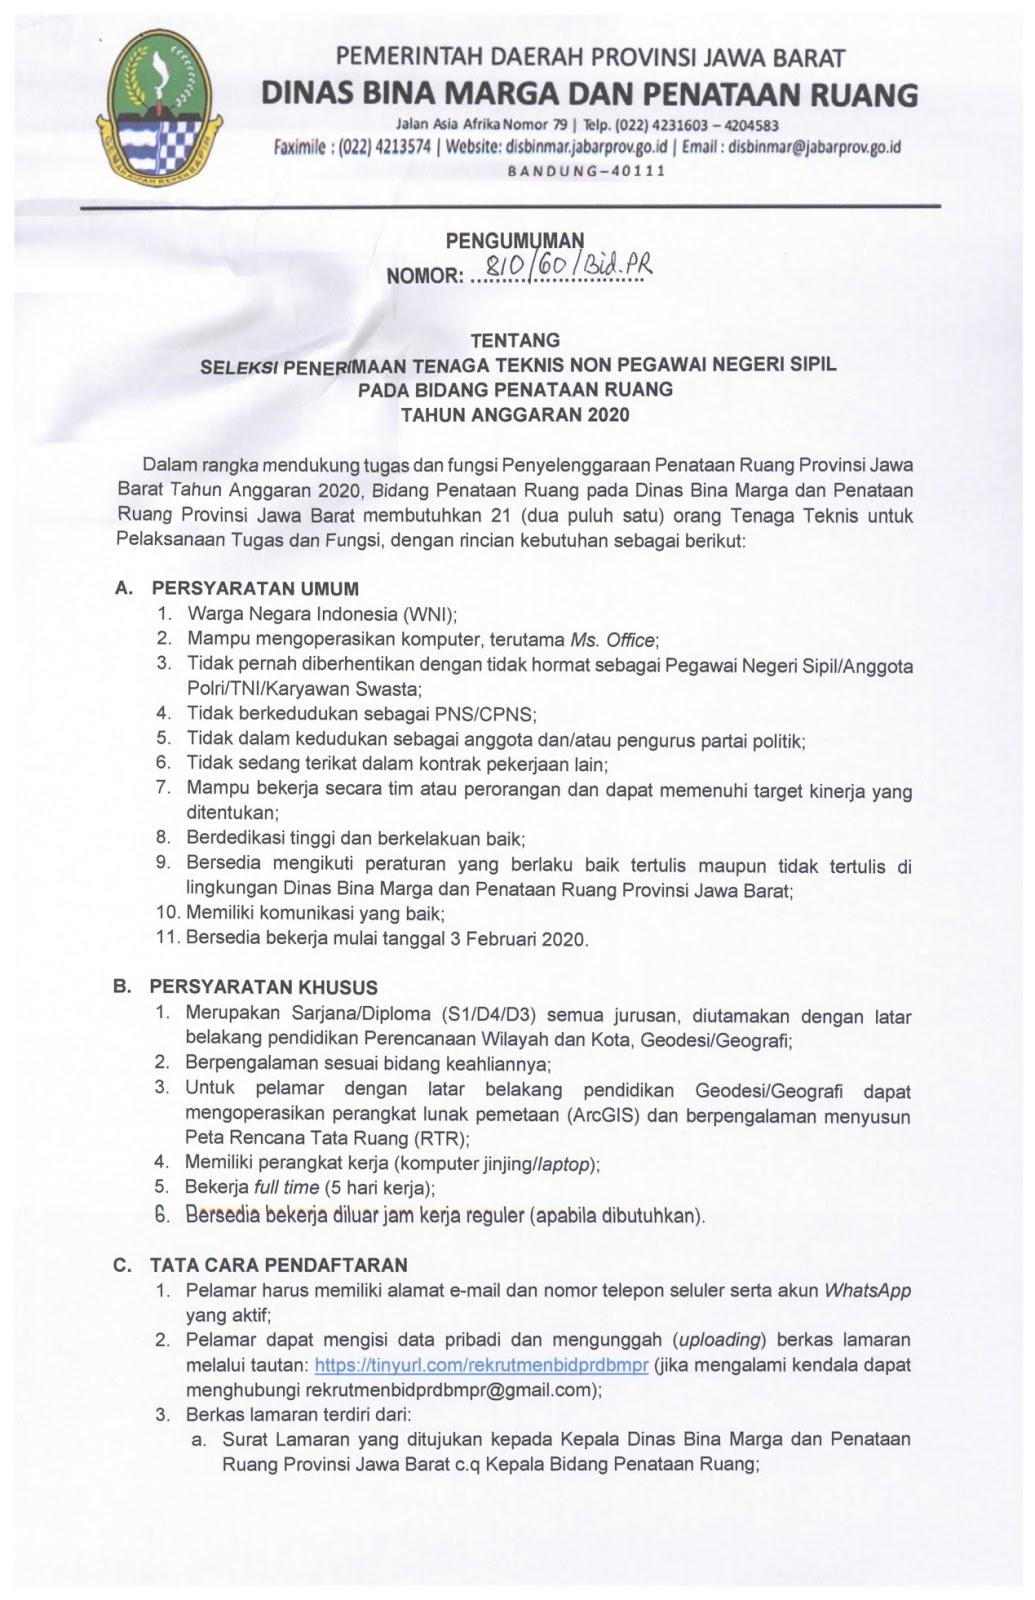 Rekrutmen Non PNS Dinas Bina Marga dan Penataan Ruang Provinsi Jabar Tahun 2020